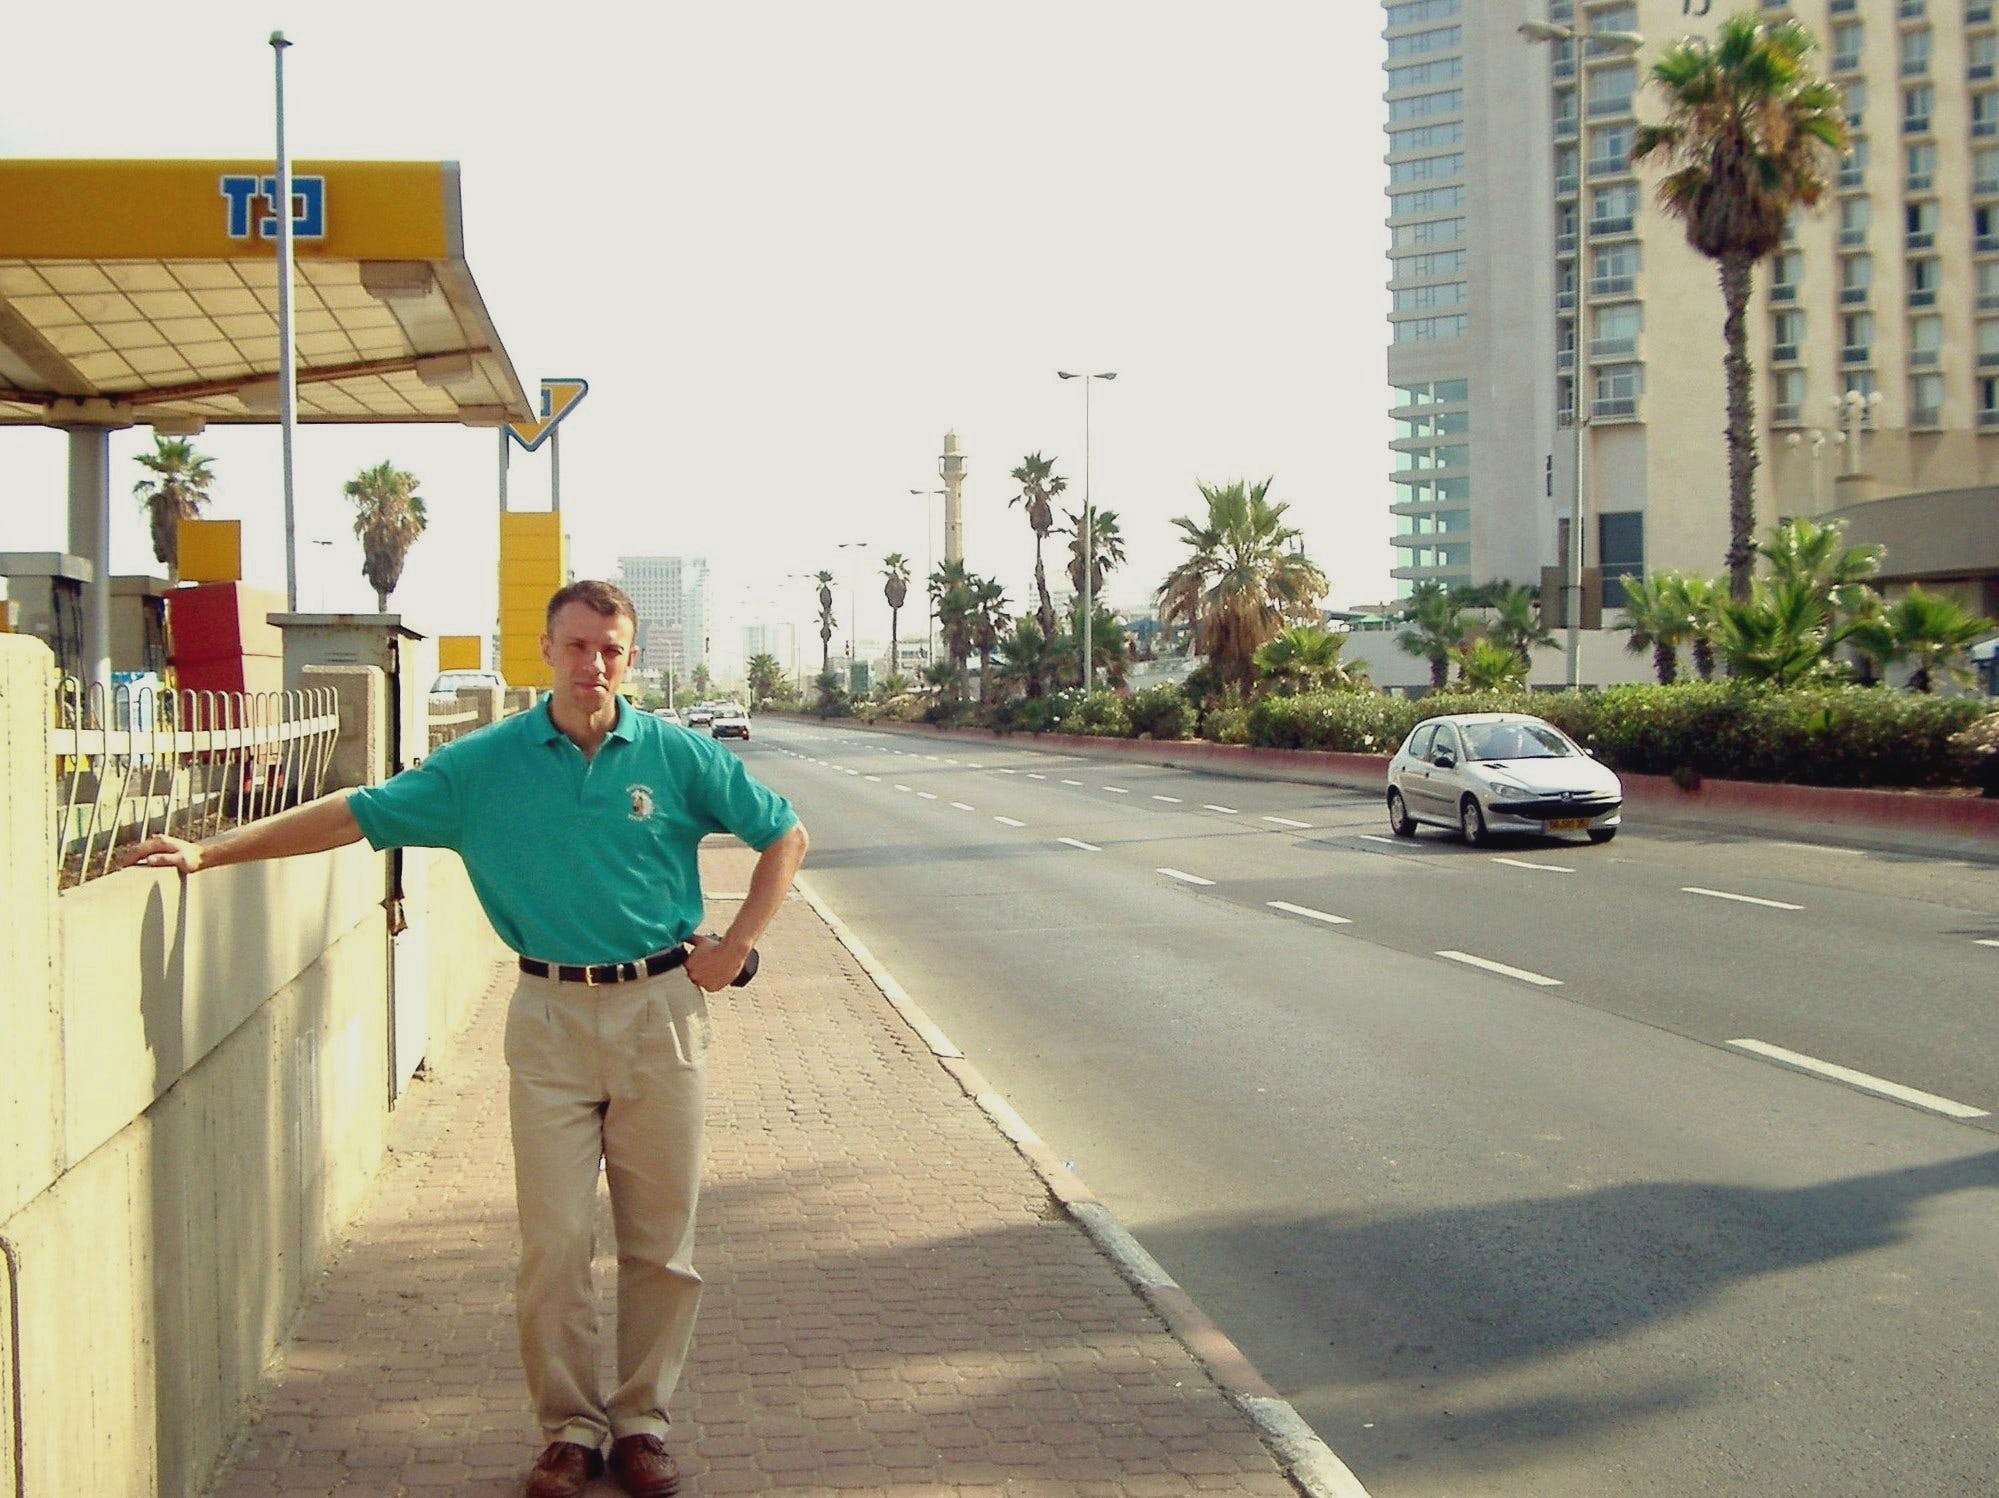 Free stock photo of Israel, tel aviv